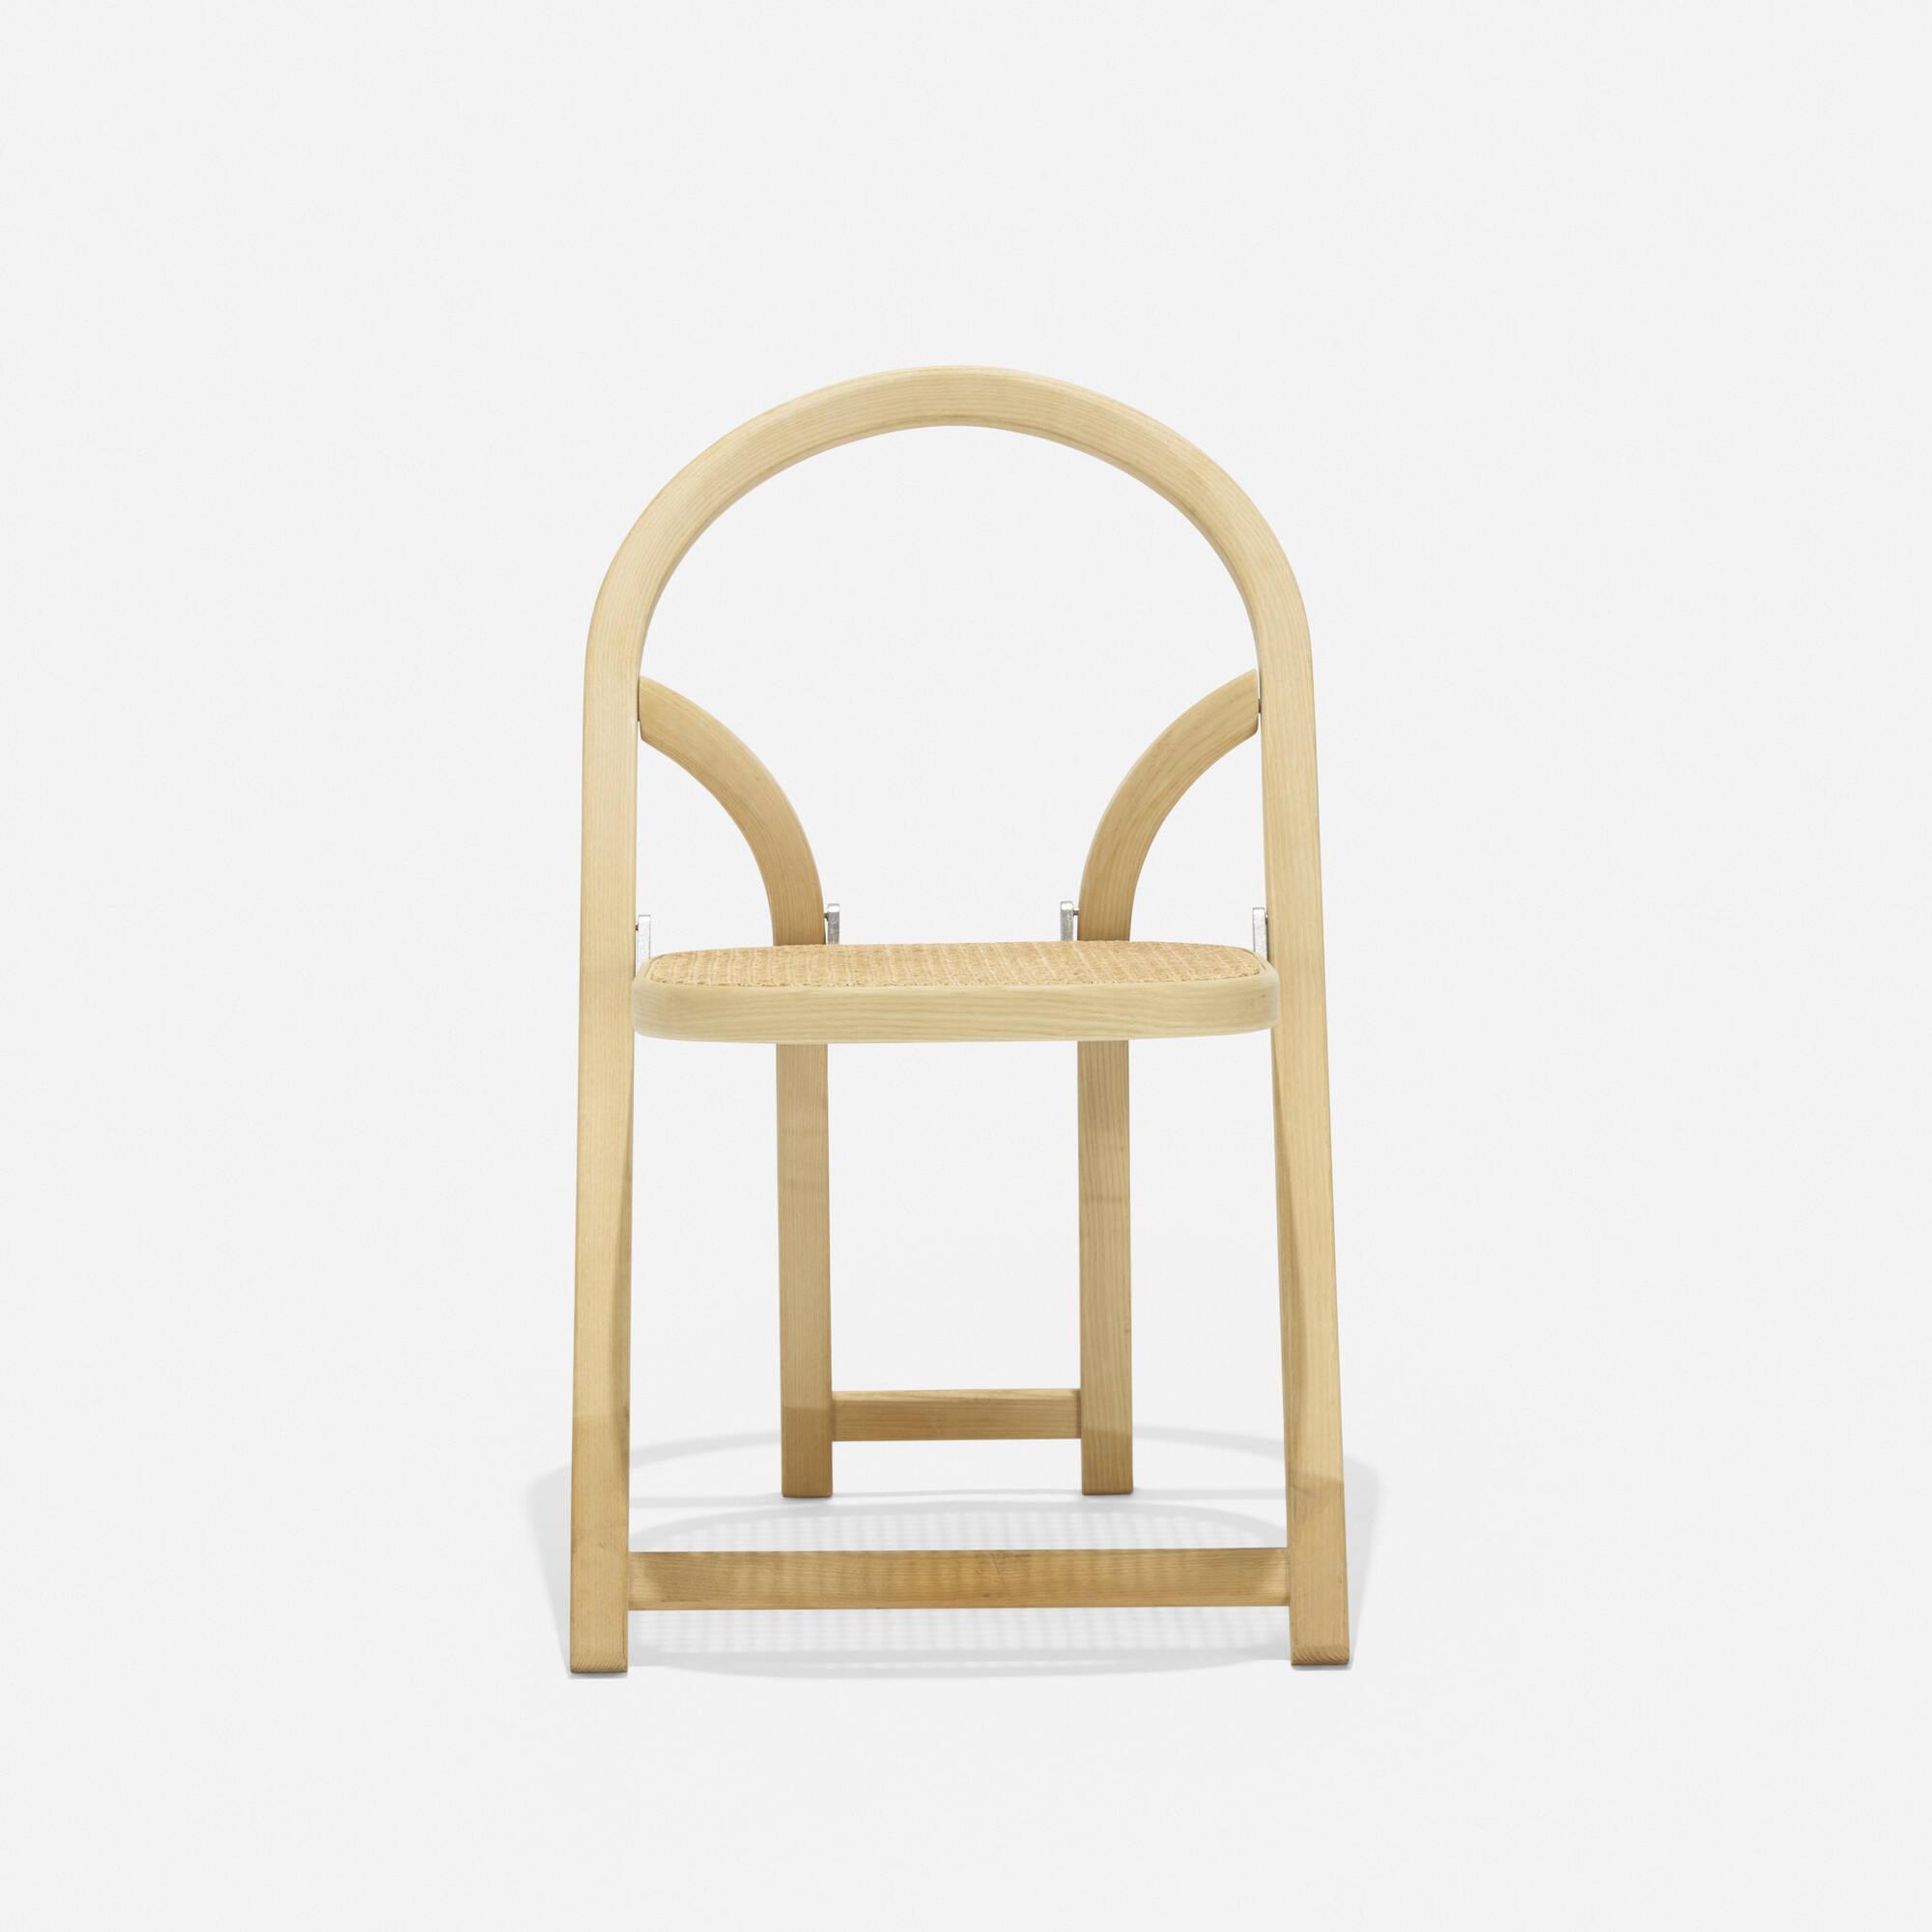 344: Gigi Sabadin / Arca chair (2 of 3)